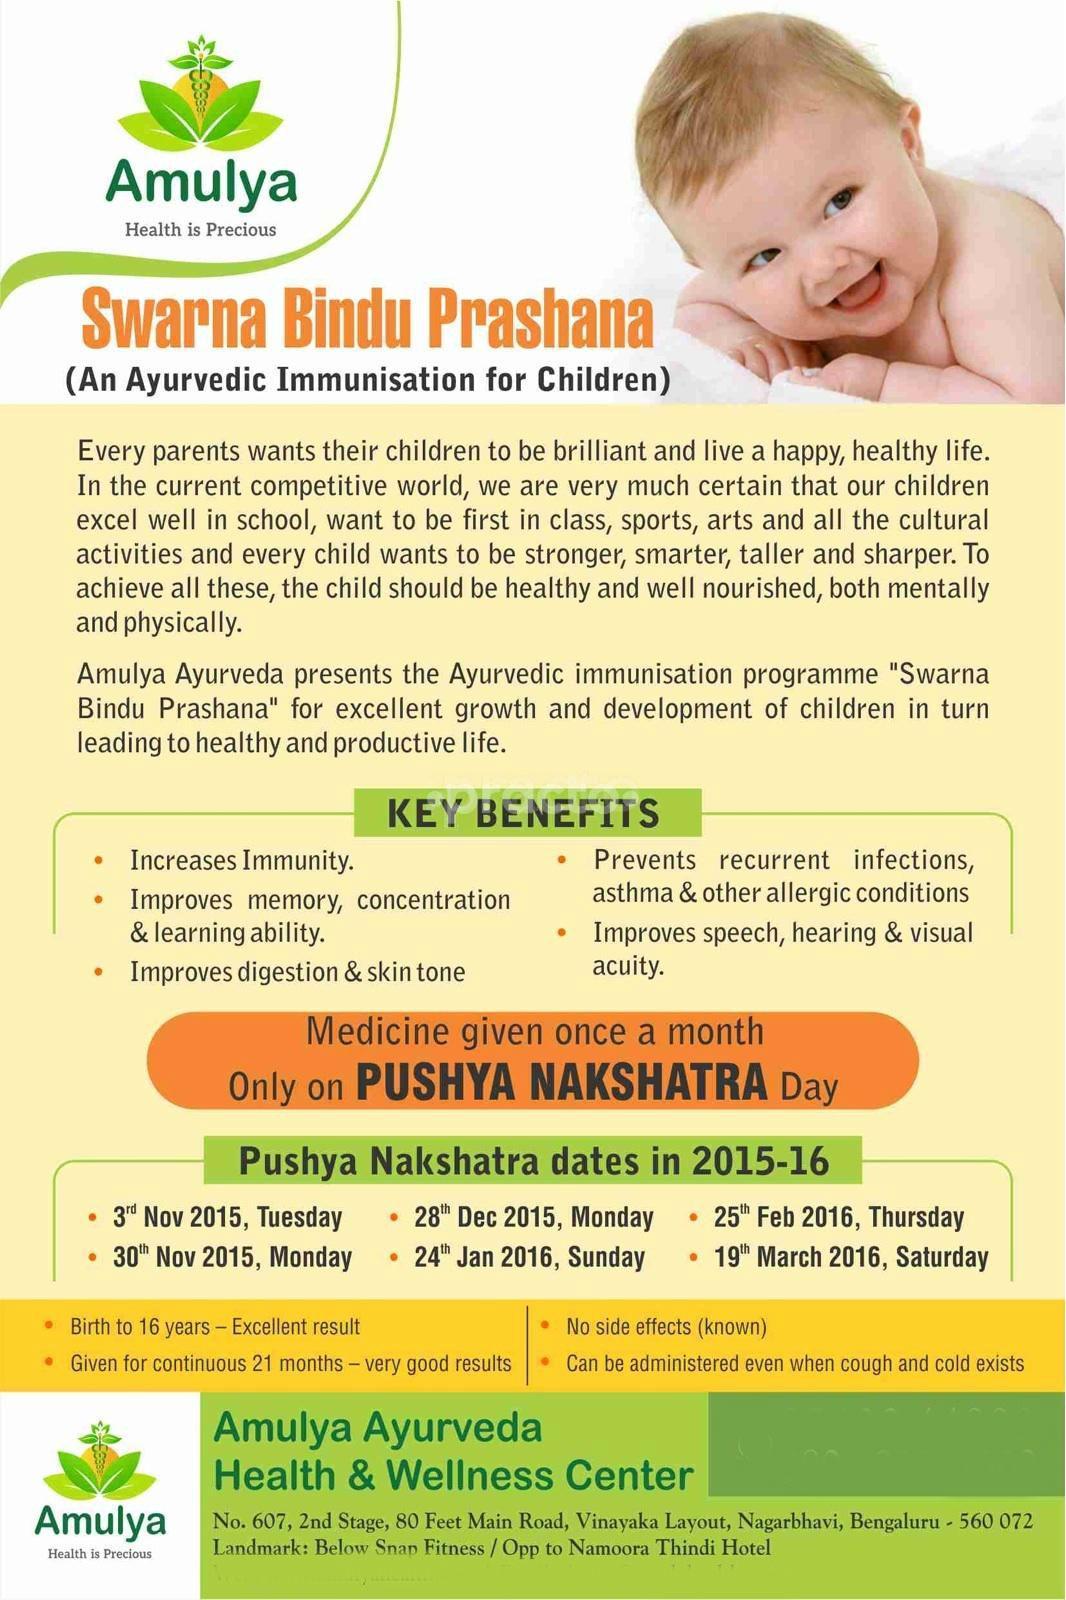 Amulya Ayurveda Health and Wellness Centre, Multi-Speciality